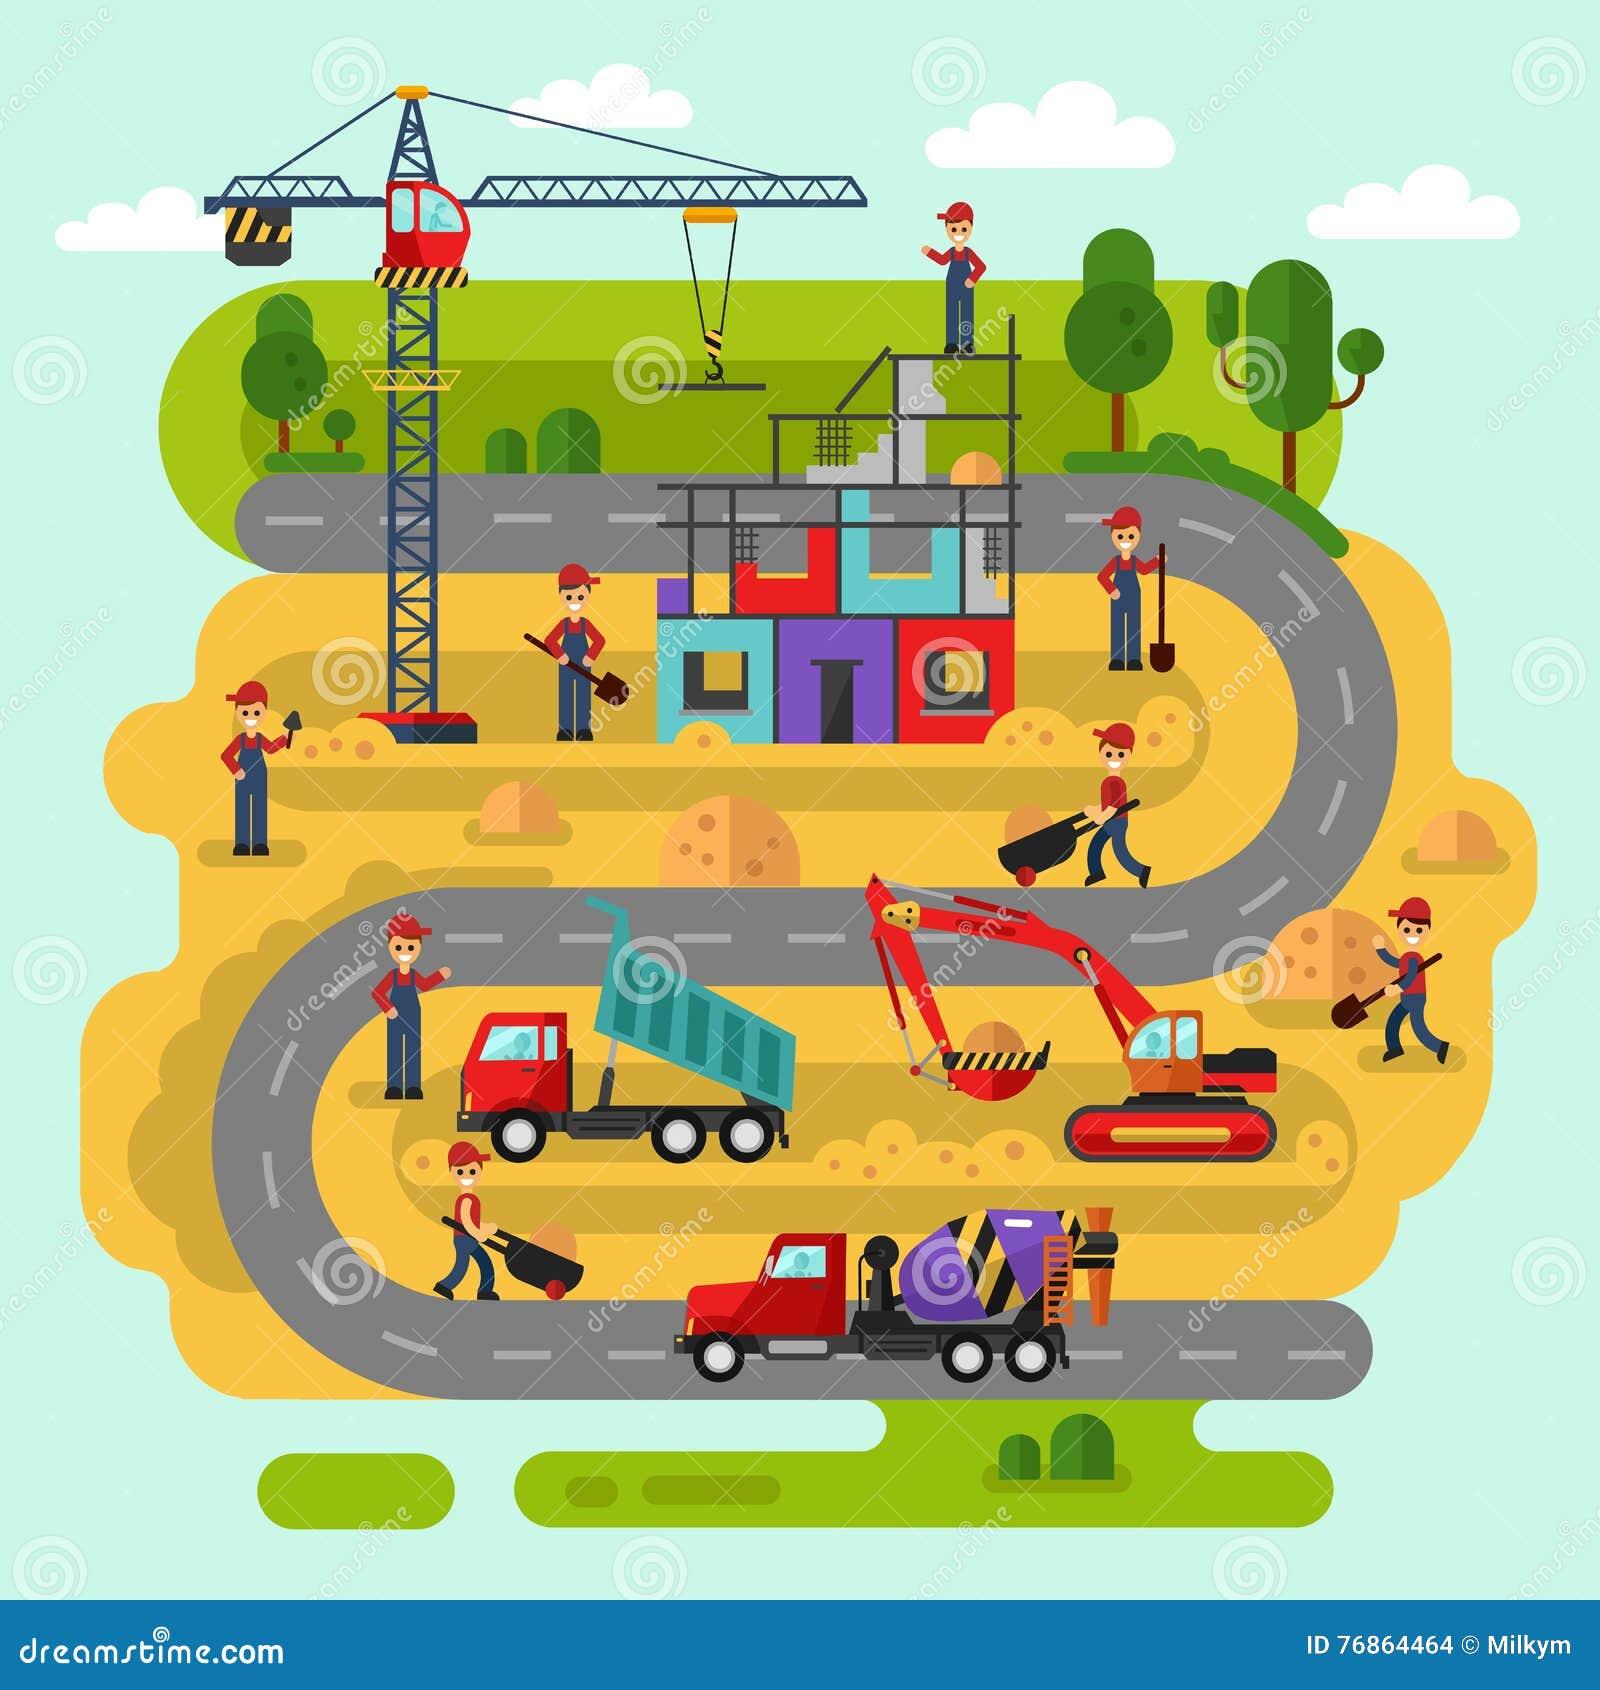 Arbetare bygger ett hus